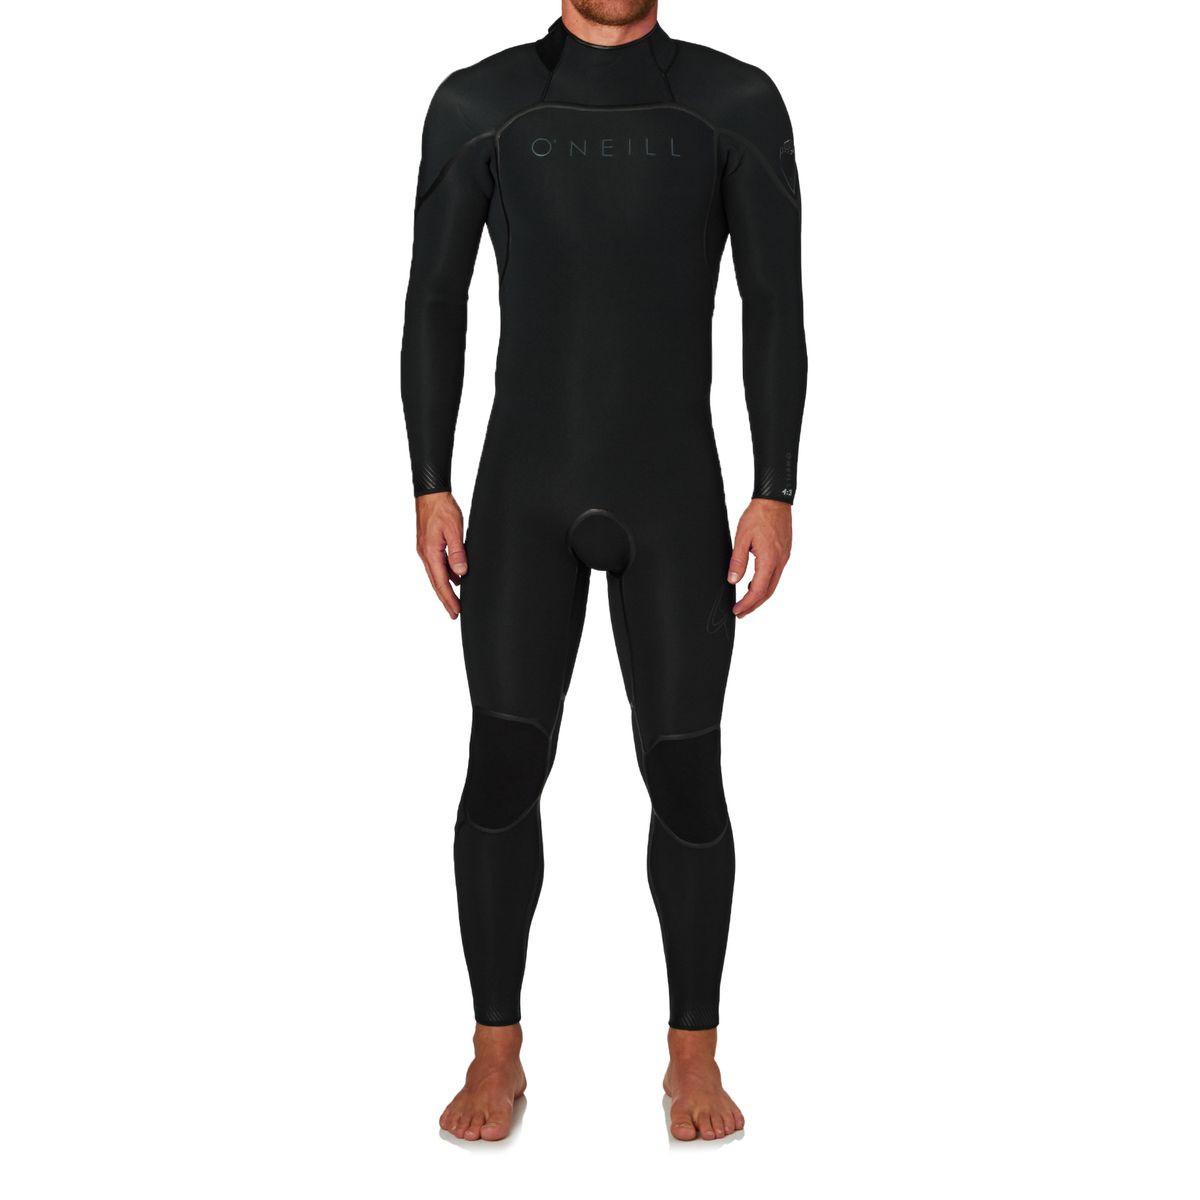 O'Neill Psycho One 4/3mm 2017 Back Zip Wetsuit - Black/ Black/ Graphite